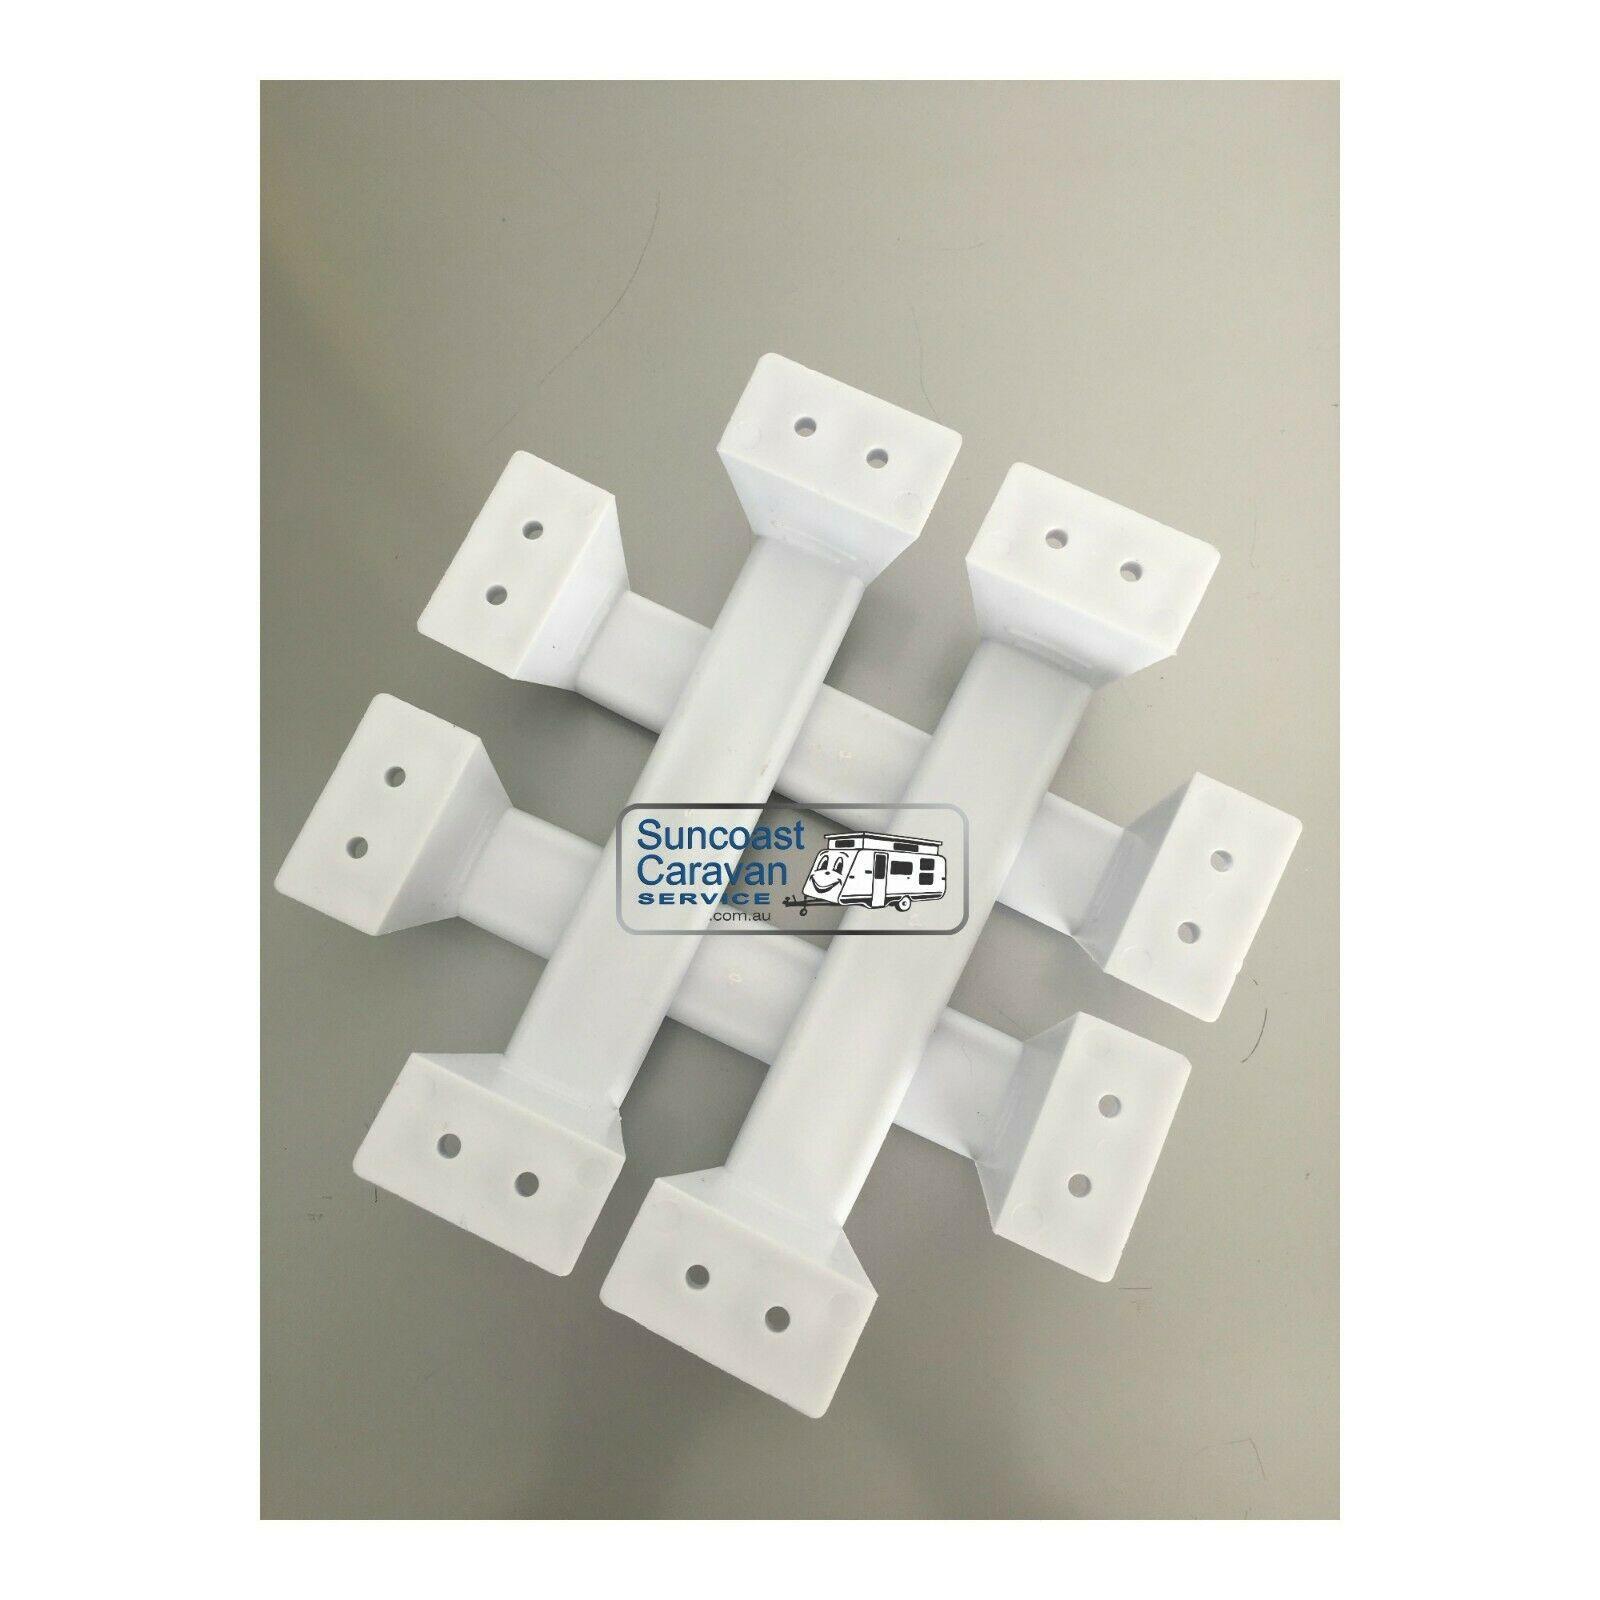 Camec Caravan Grab Handles White Plastic Set Of 4 Uv